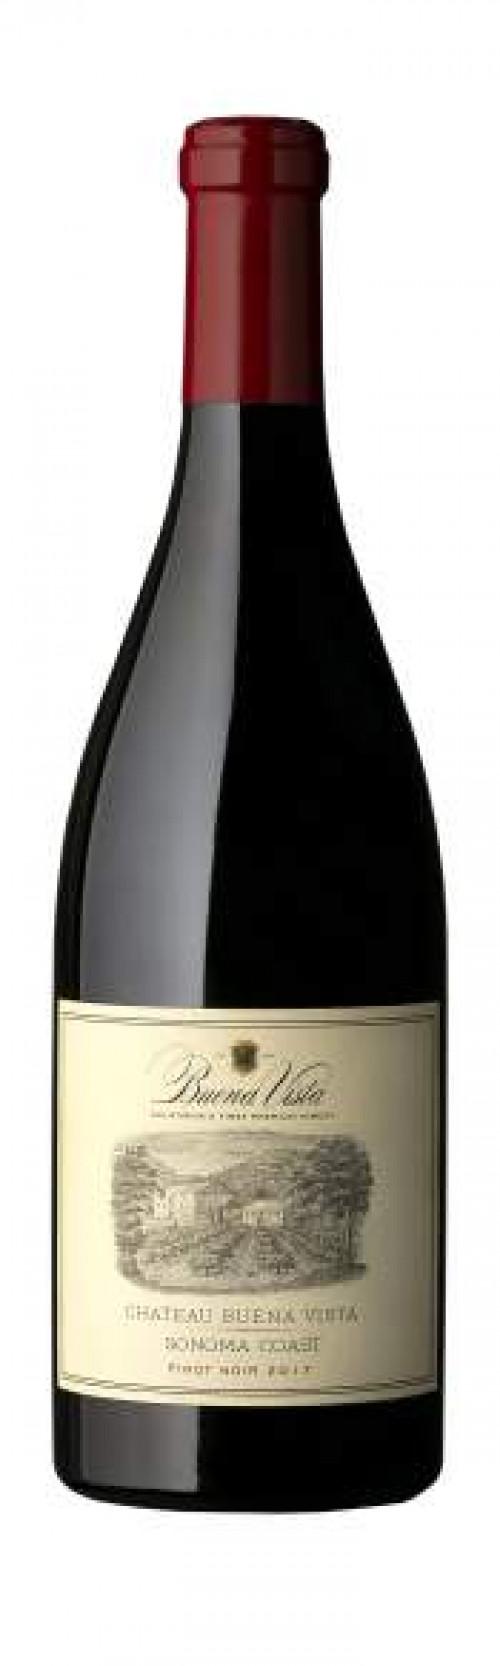 2017 Buena Vista Chateau Buena Vista Sonoma Pinot Noir 750ml